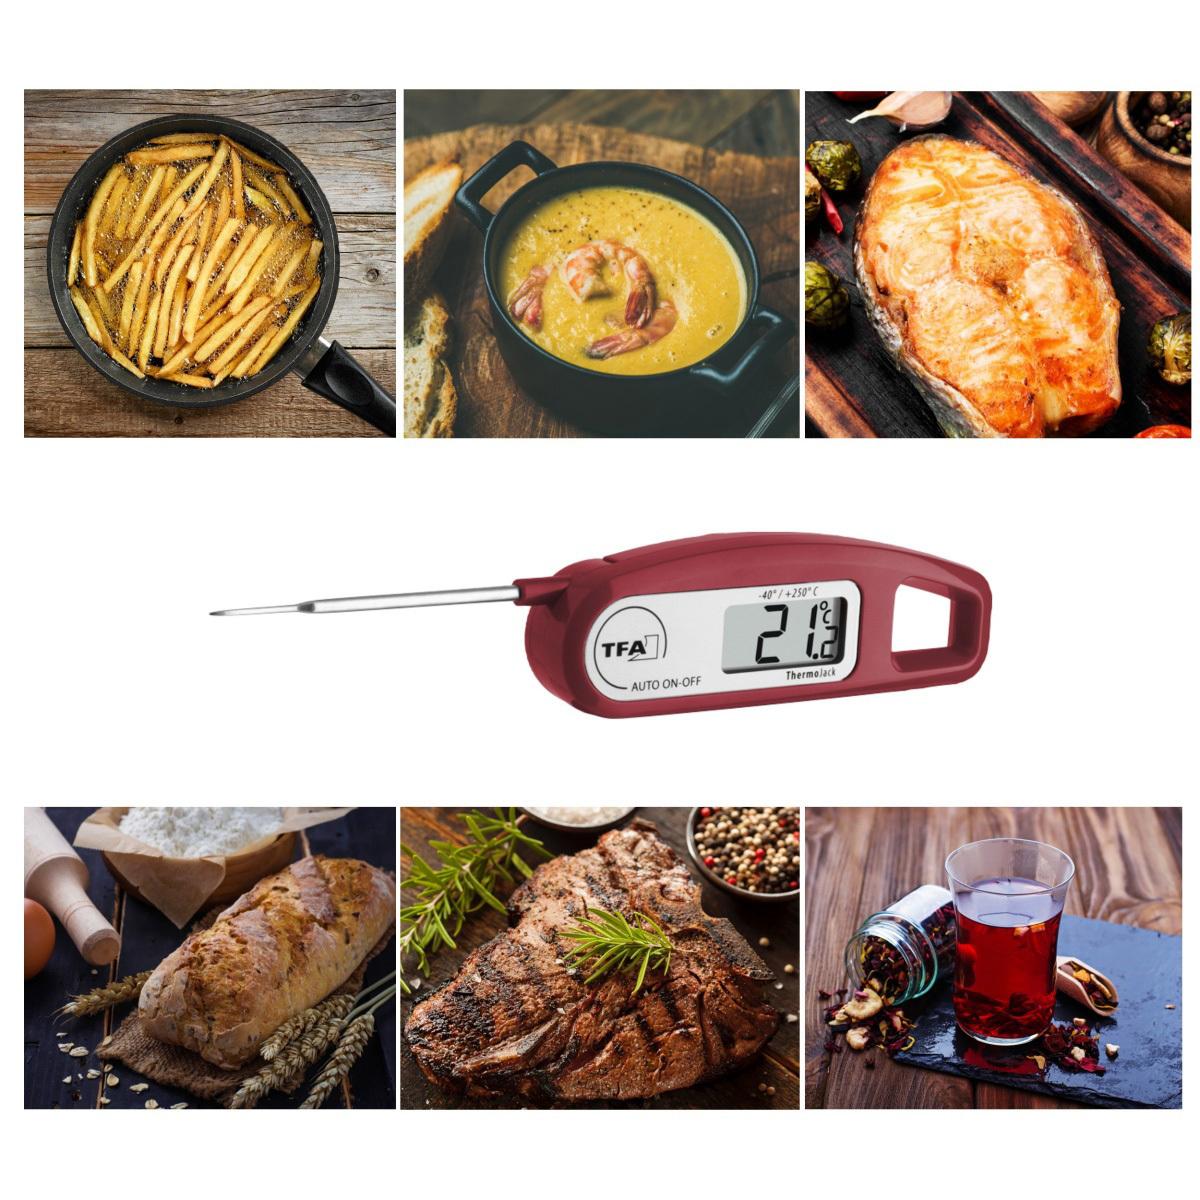 30-1047-05-digitales-einstich-thermometer-thermo-jack-anwendung-1200x1200px.jpg